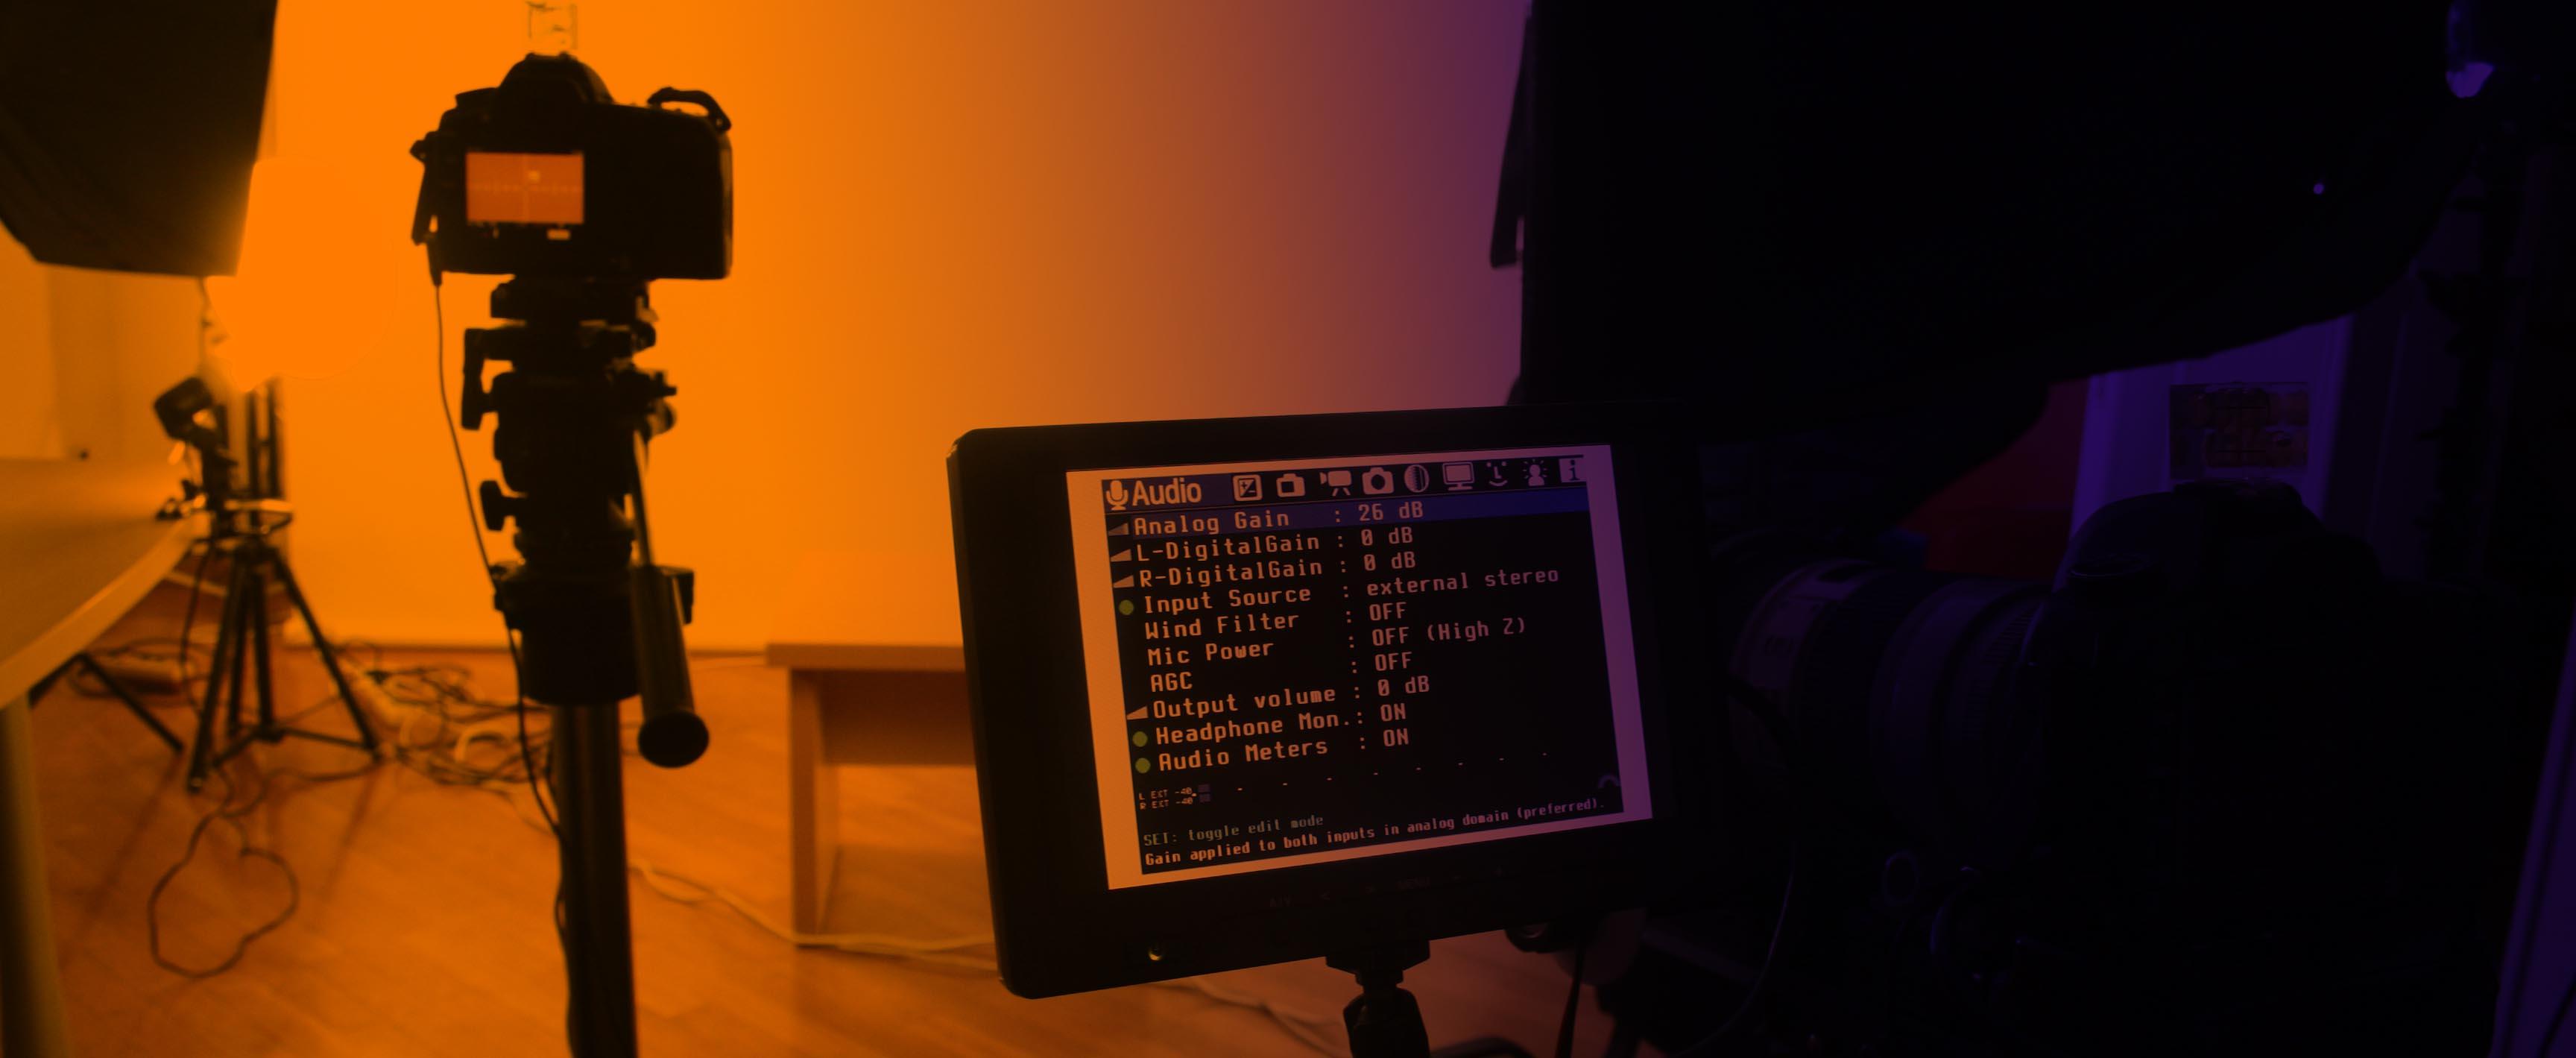 http://cdn2.hubspot.net/hub/32387/file-1665524032-jpg/new_pic-1.jpg